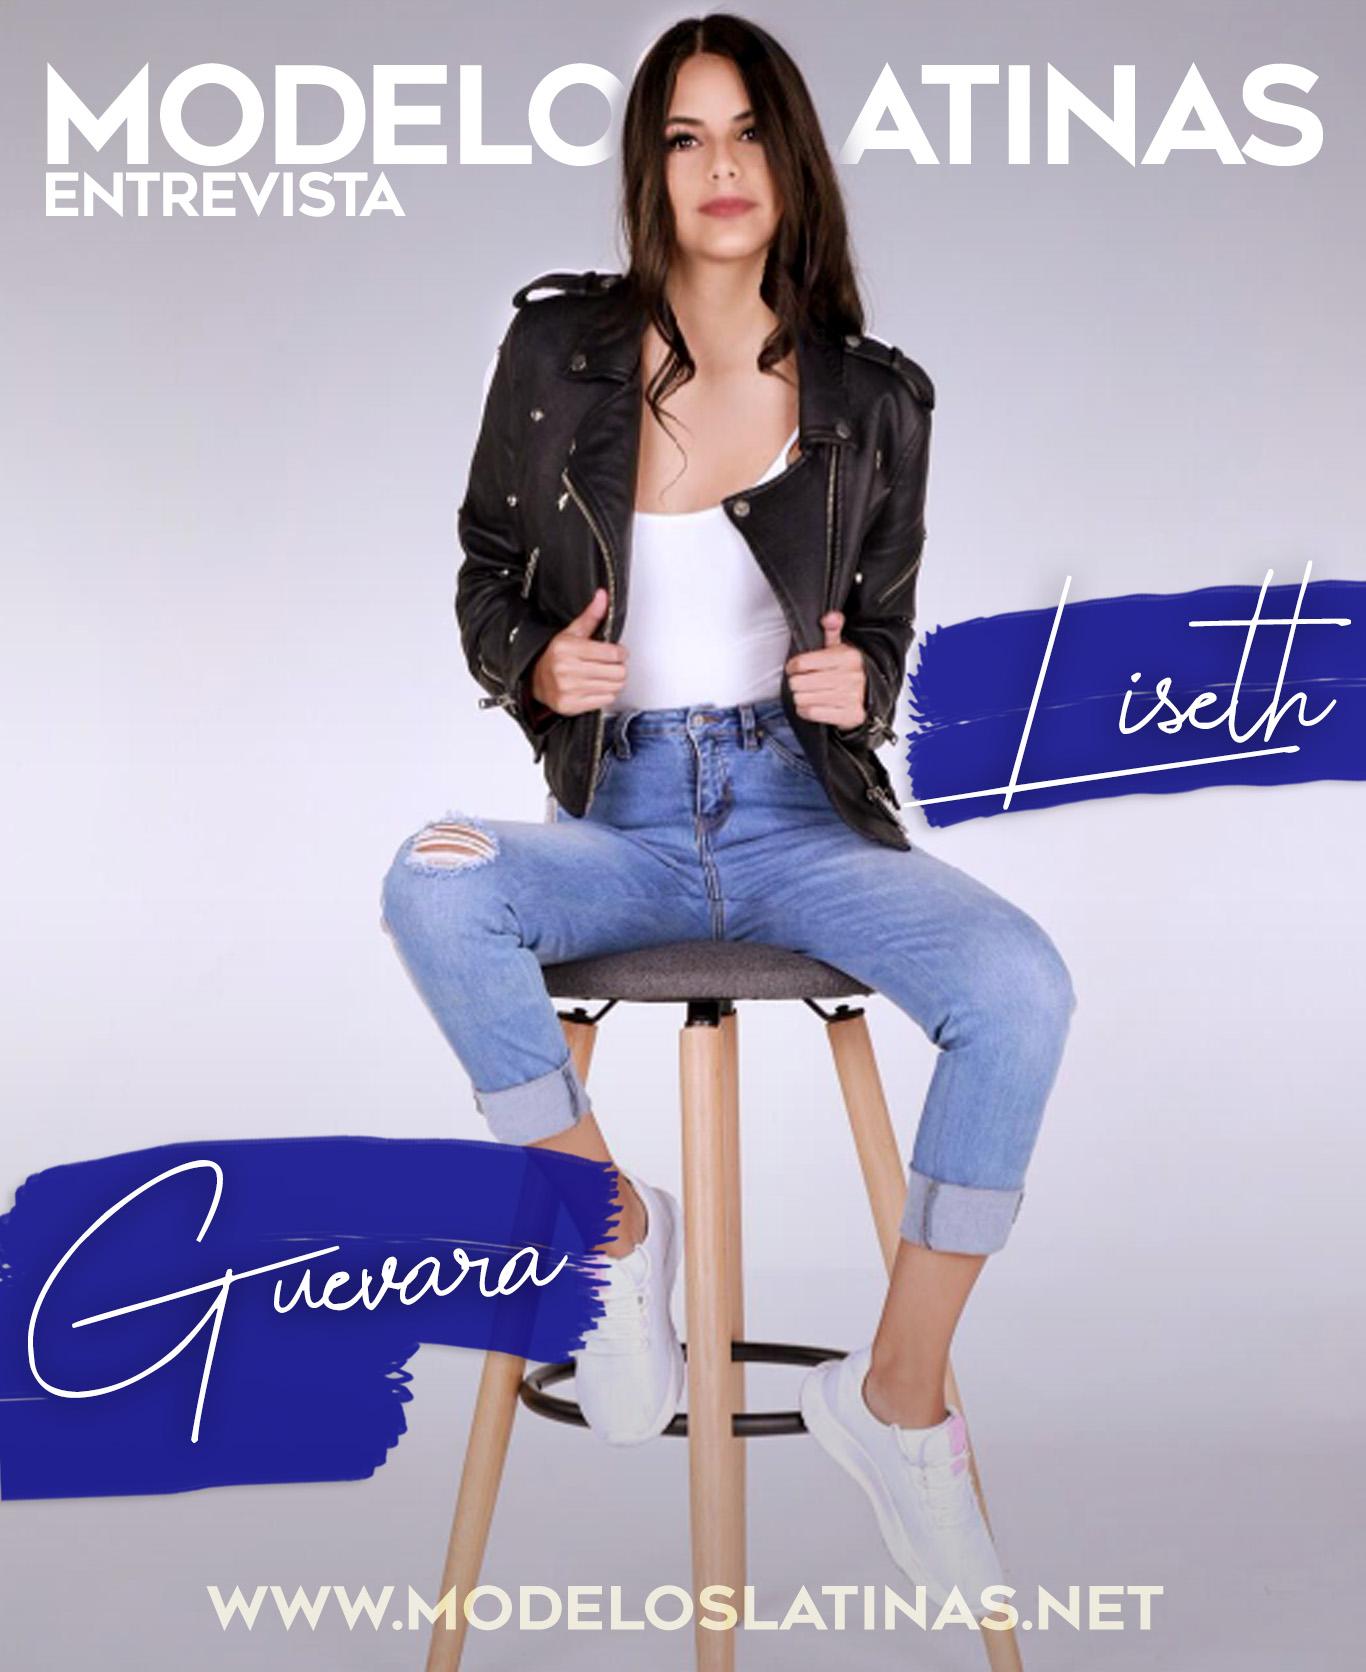 Liseth Guevara